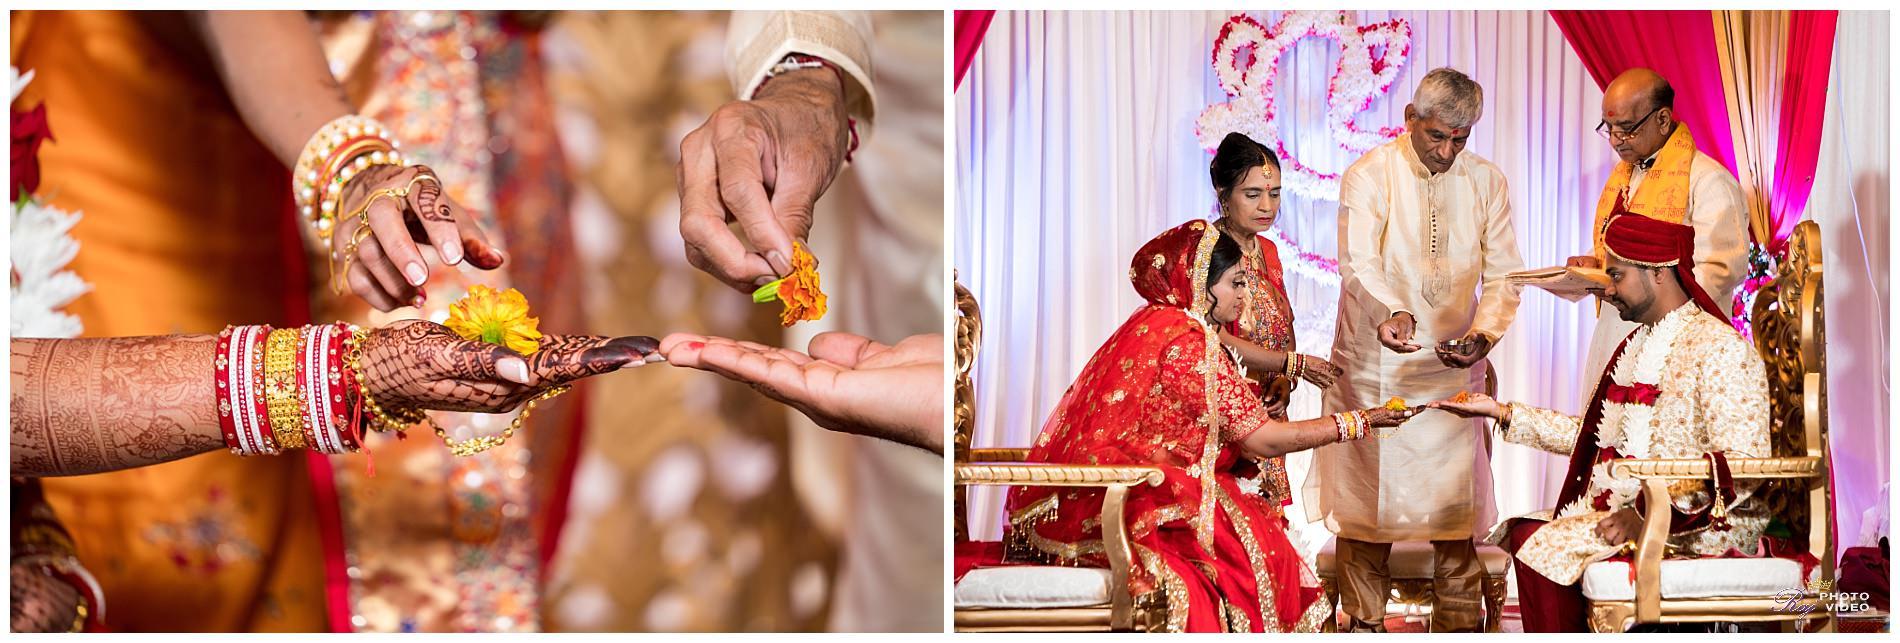 doubletree-by-hilton-hotel-wilmington-de-wedding-krishna-ritesh-57.jpg